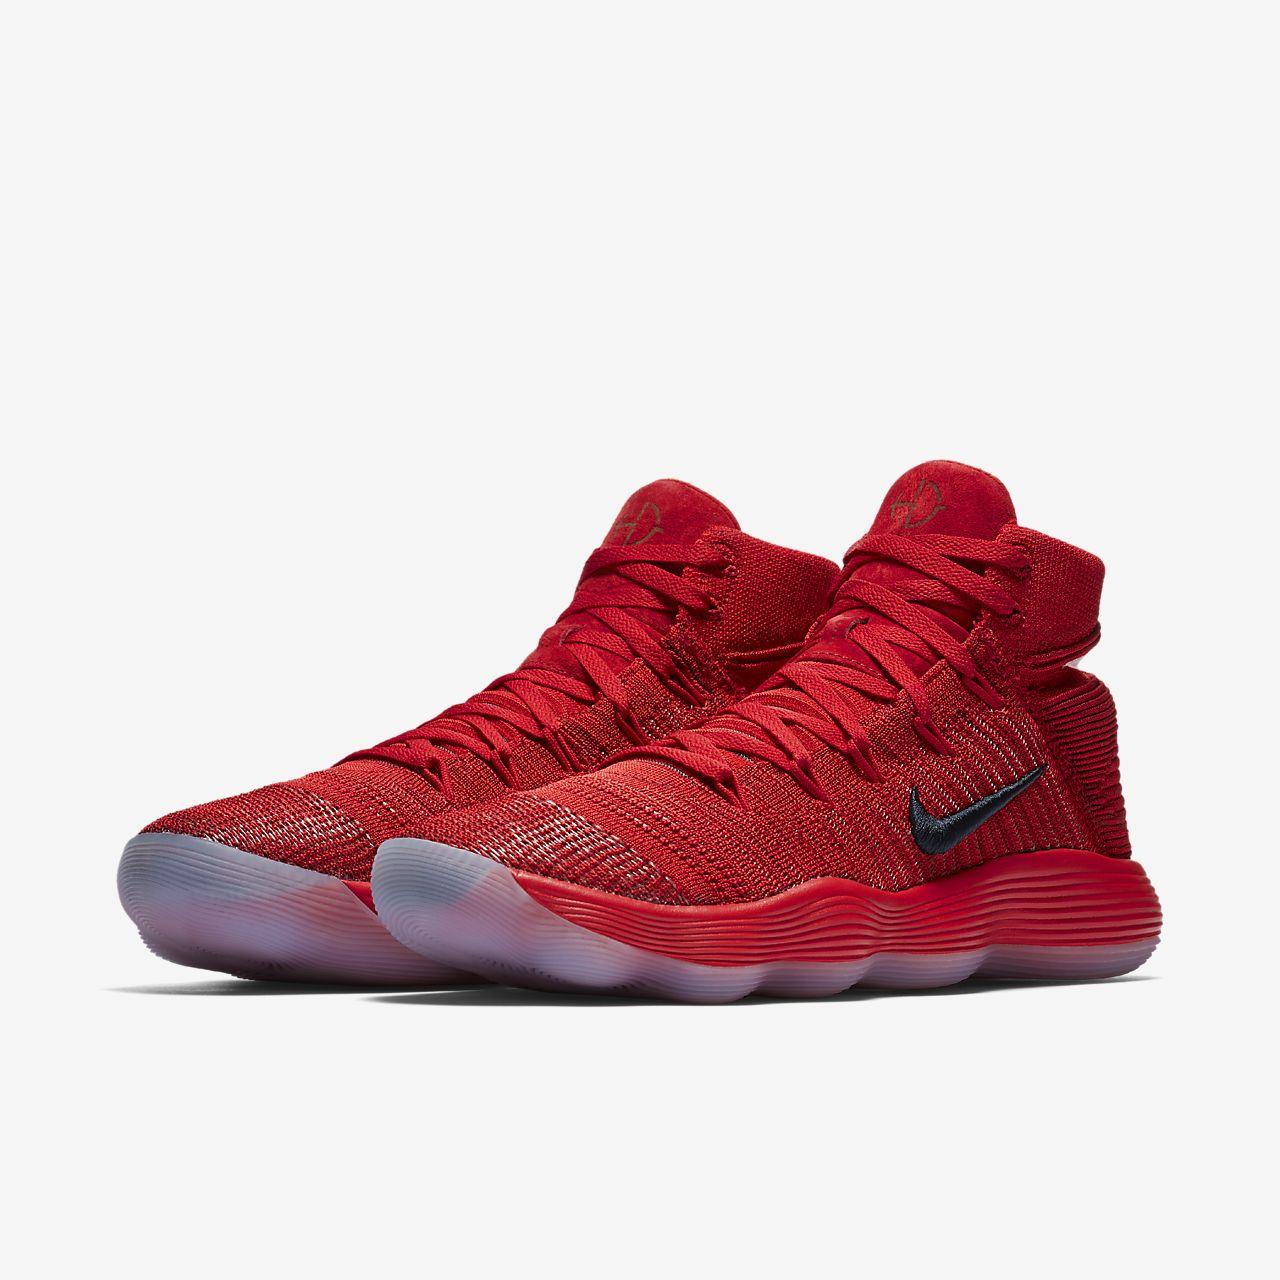 Nike Basketball Shoes Hyperdunk  Red